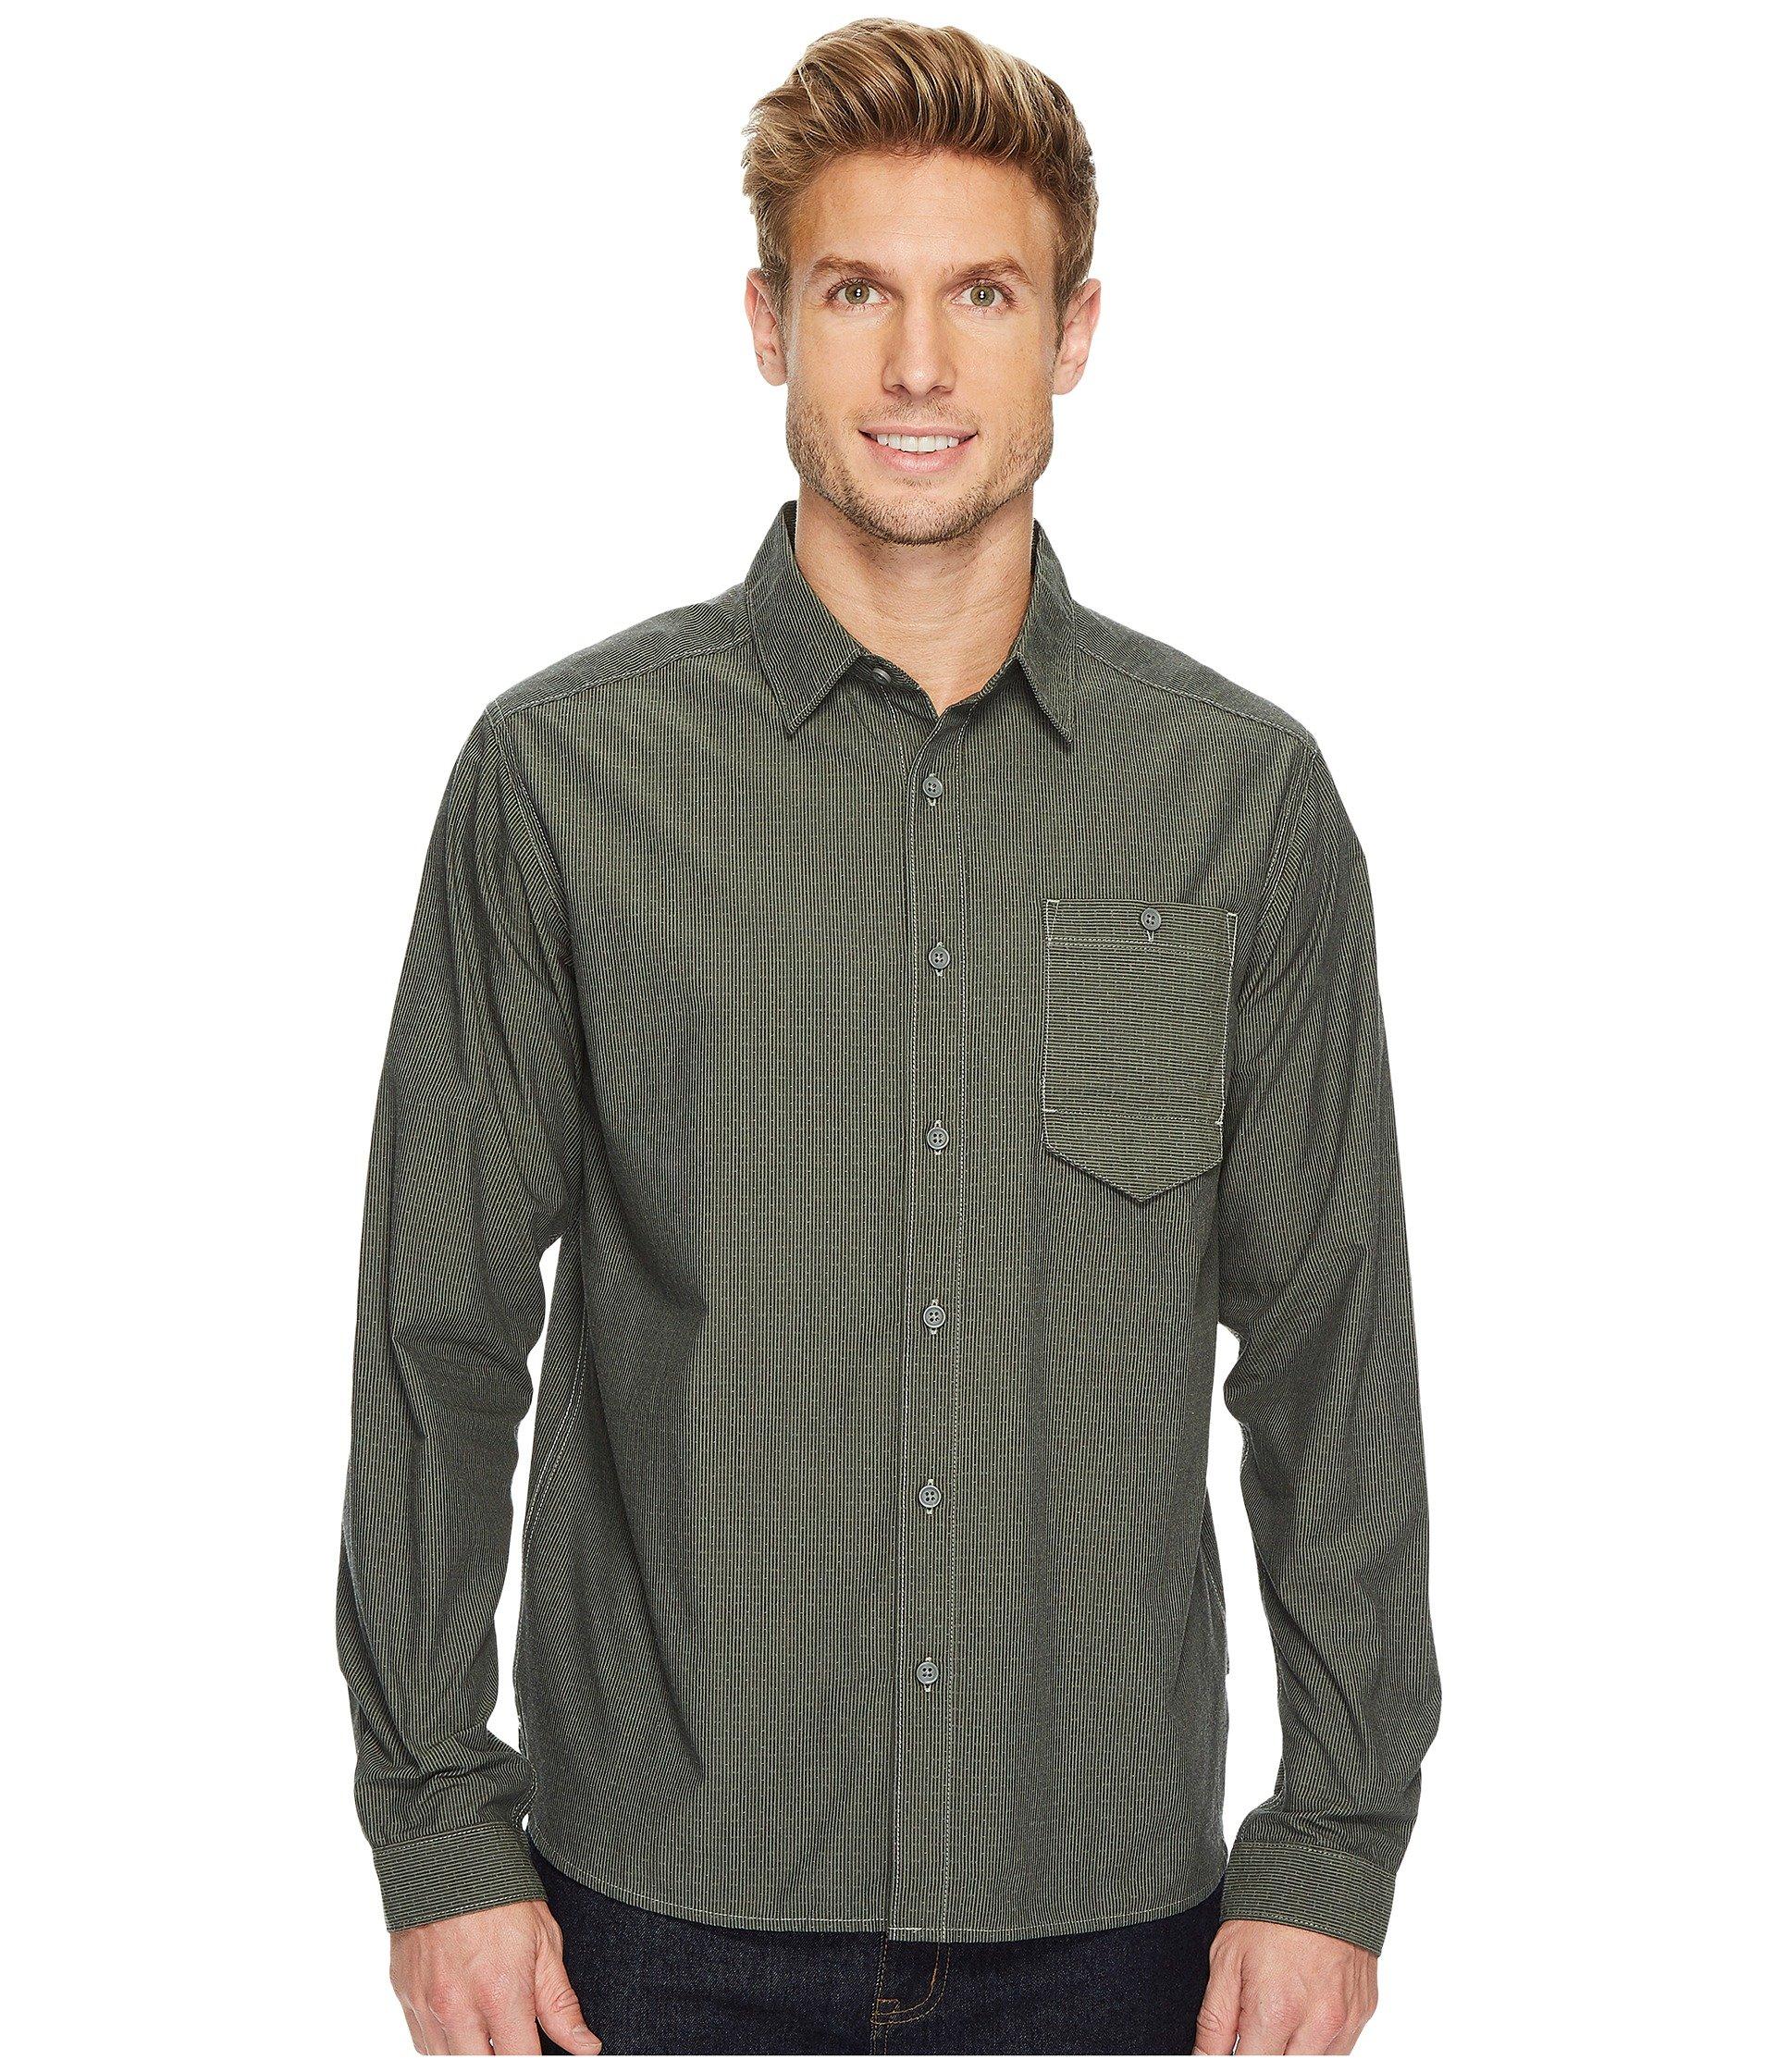 MOUNTAIN HARDWEAR Foreman Long Sleeve Shirt, Green Fade